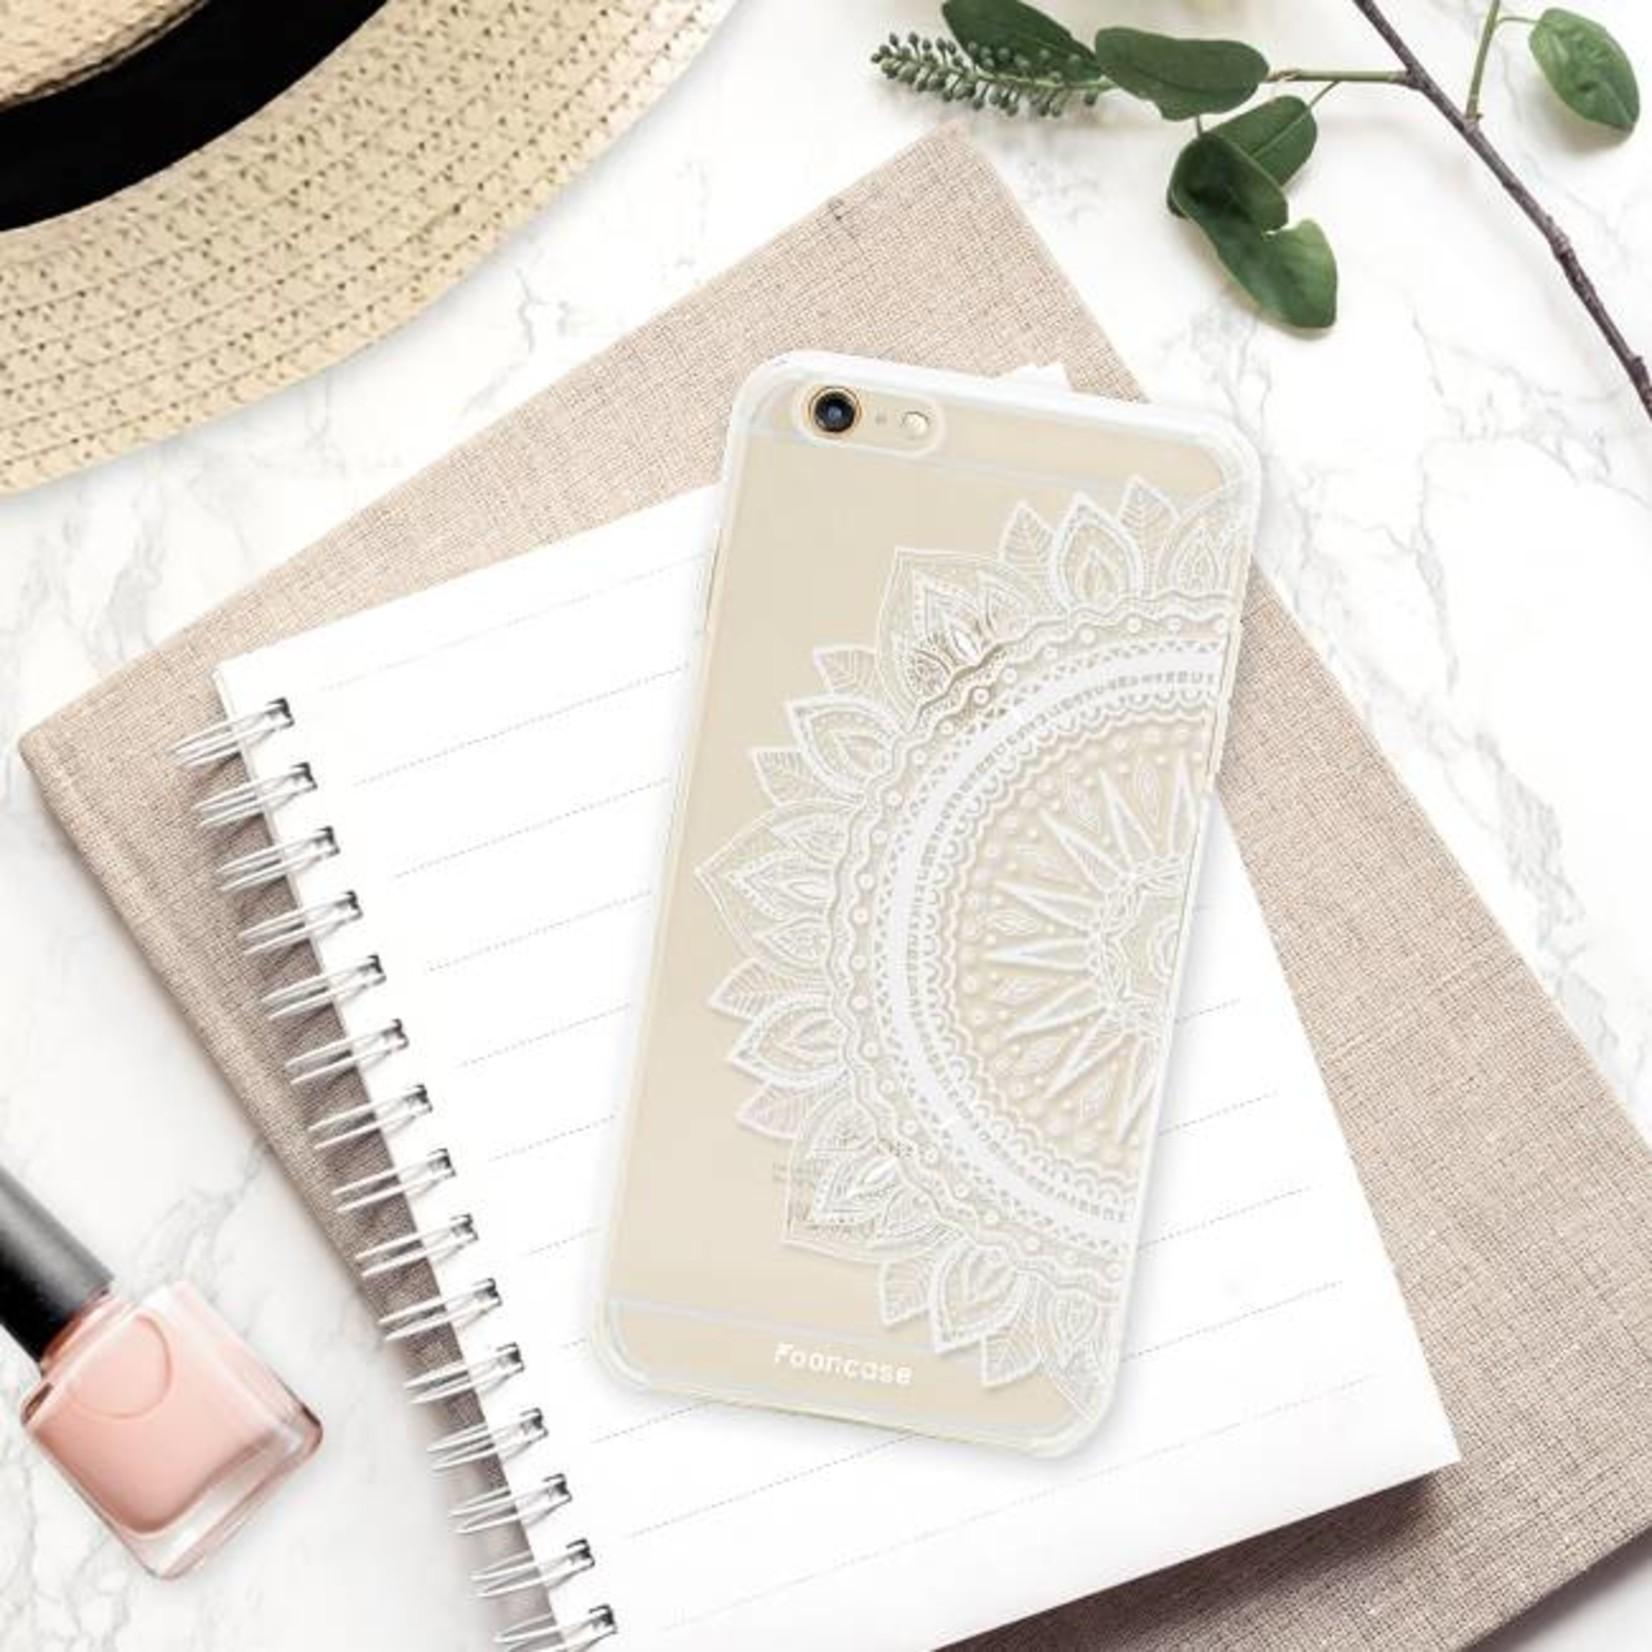 FOONCASE iPhone 6 Plus hoesje TPU Soft Case - Back Cover - Mandala / Ibiza